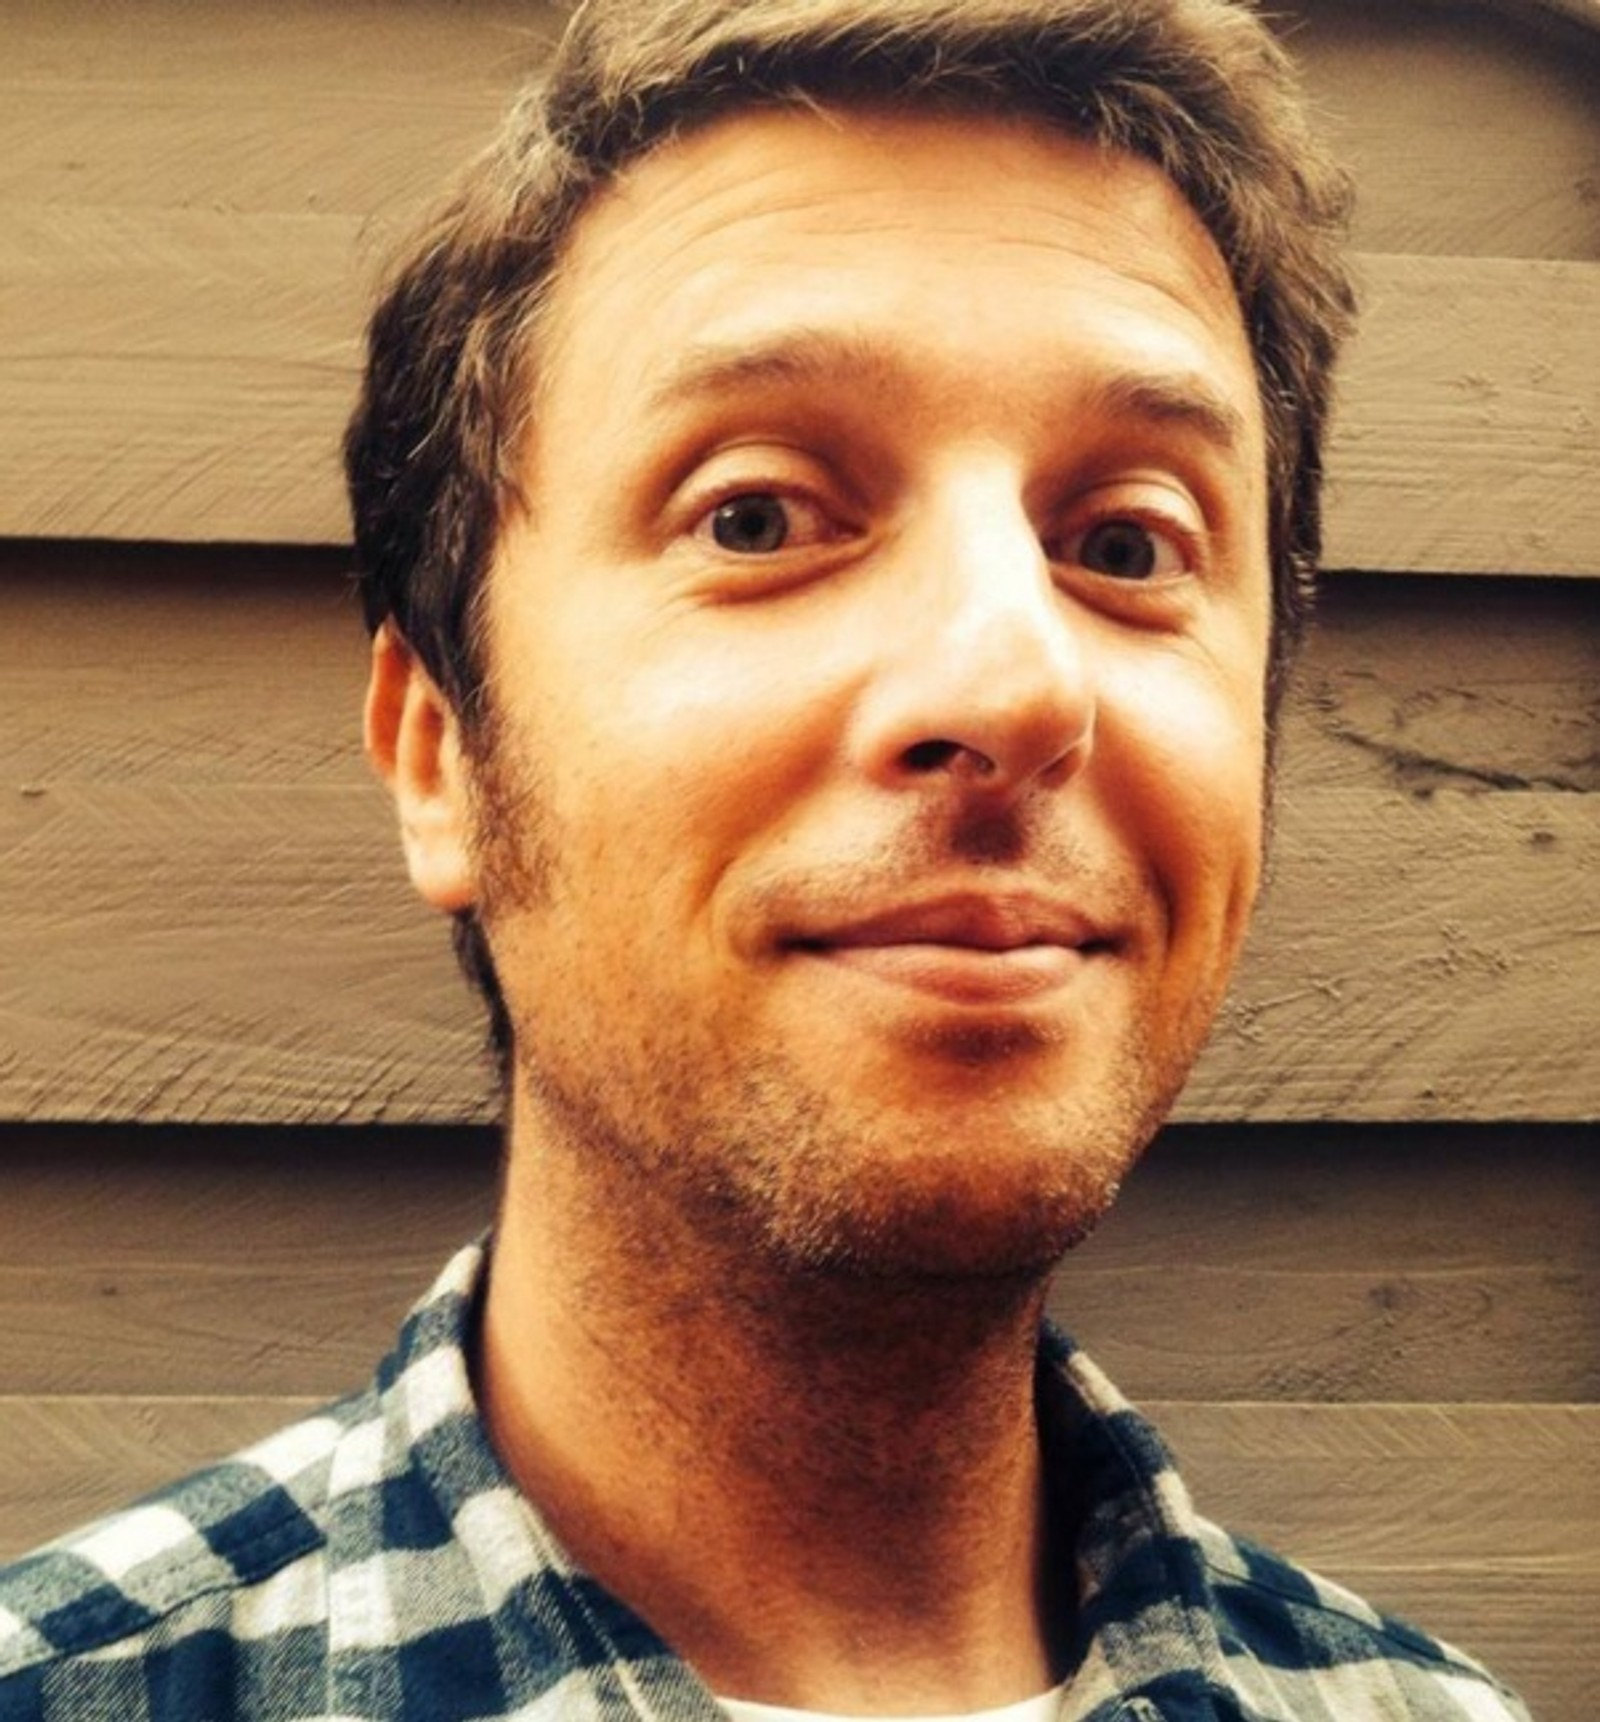 DREPT: Manu Perez (40) jobbet i Universal Music Group. Han og kollegaen Thomas Ayad ble drept i Bataclan konserthus.